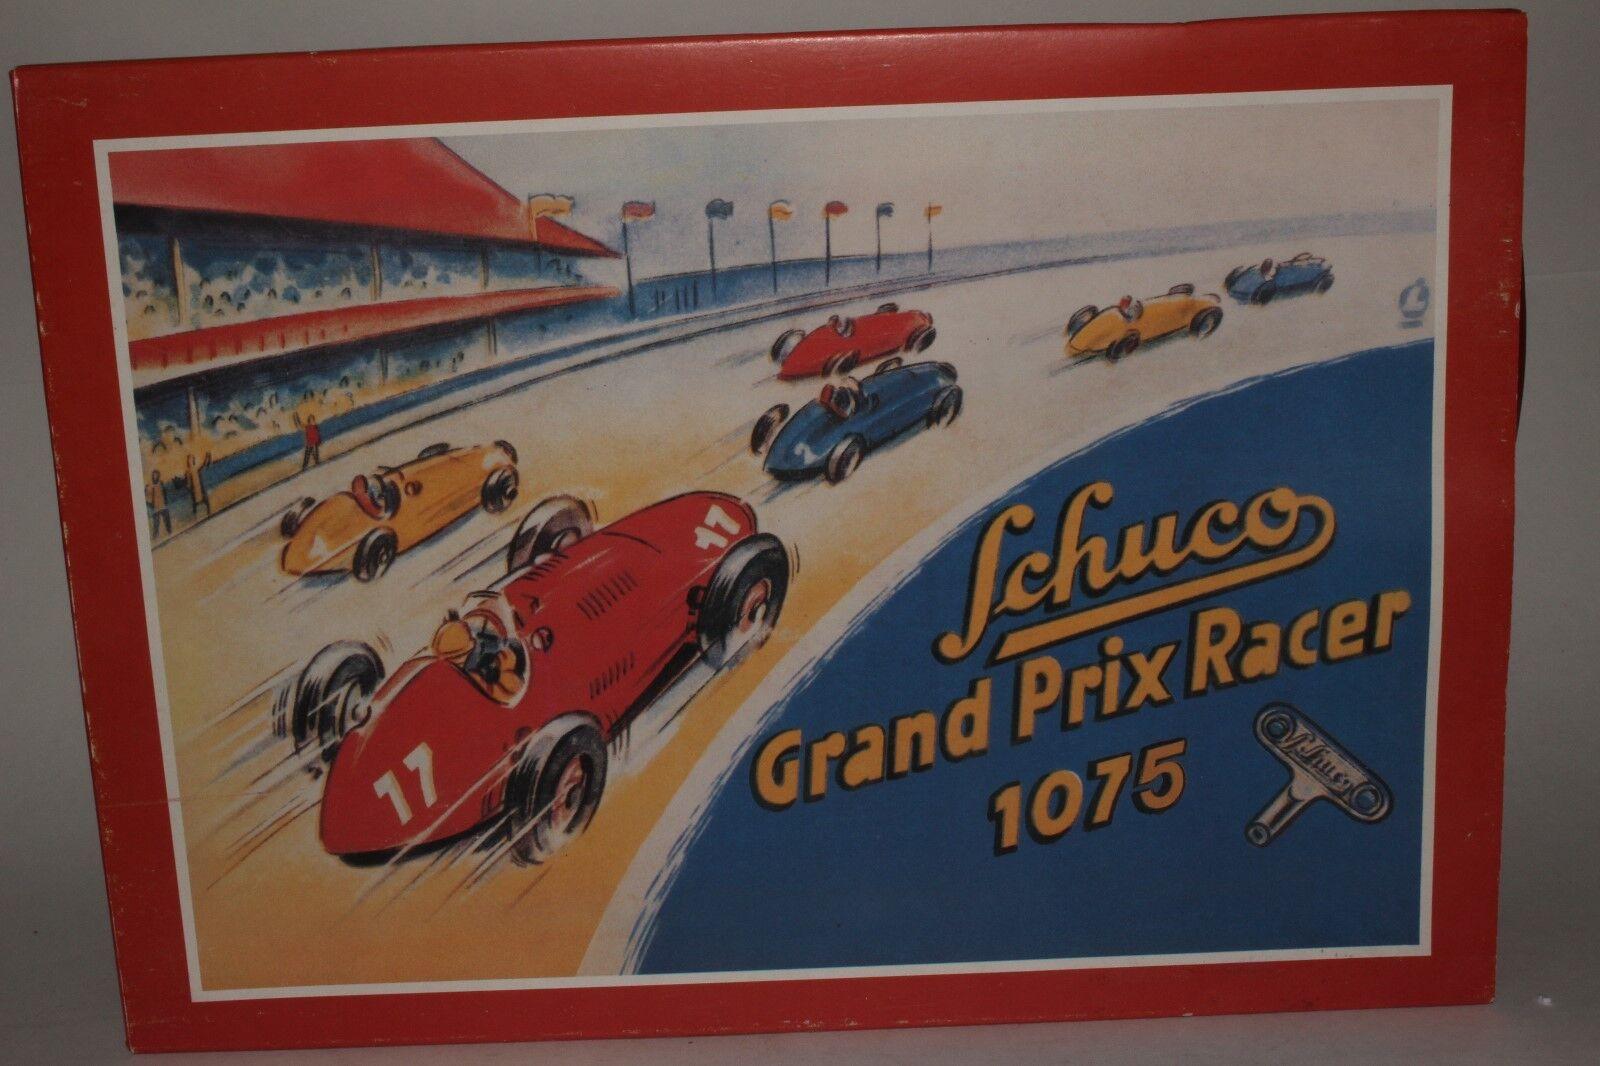 Schuco repliken 1070   1075 grand - prix - racer mit box - gelb